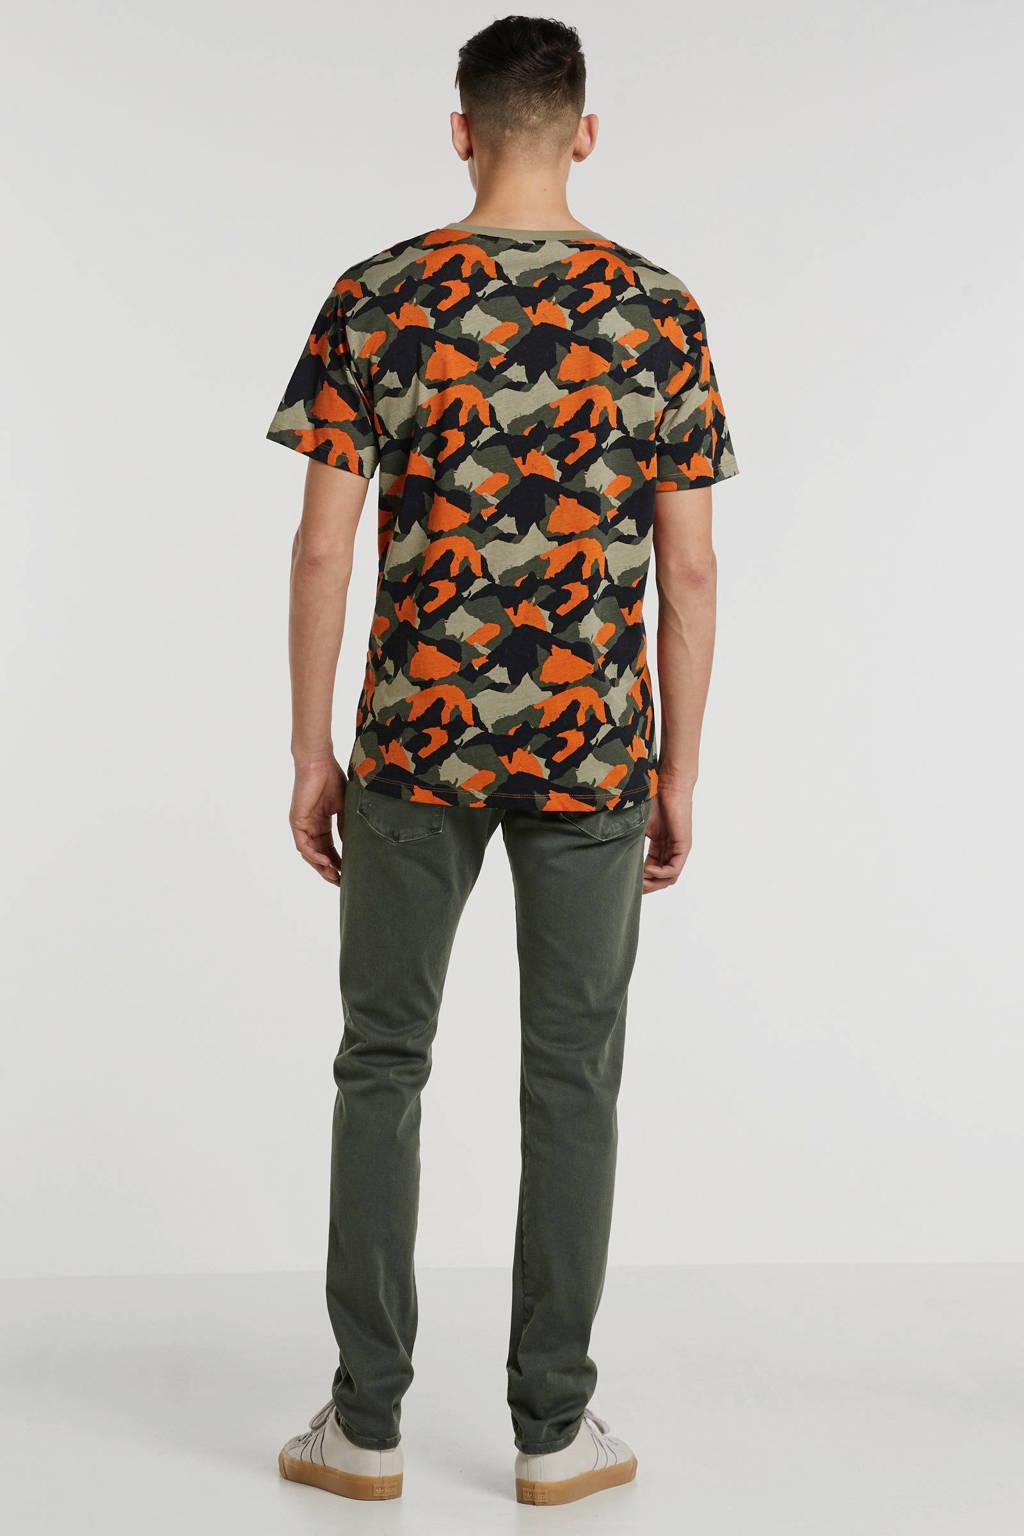 PRODUKT T-shirt met all over print oranje/donkergroen/zwart/beige, Oranje/donkergroen/zwart/beige